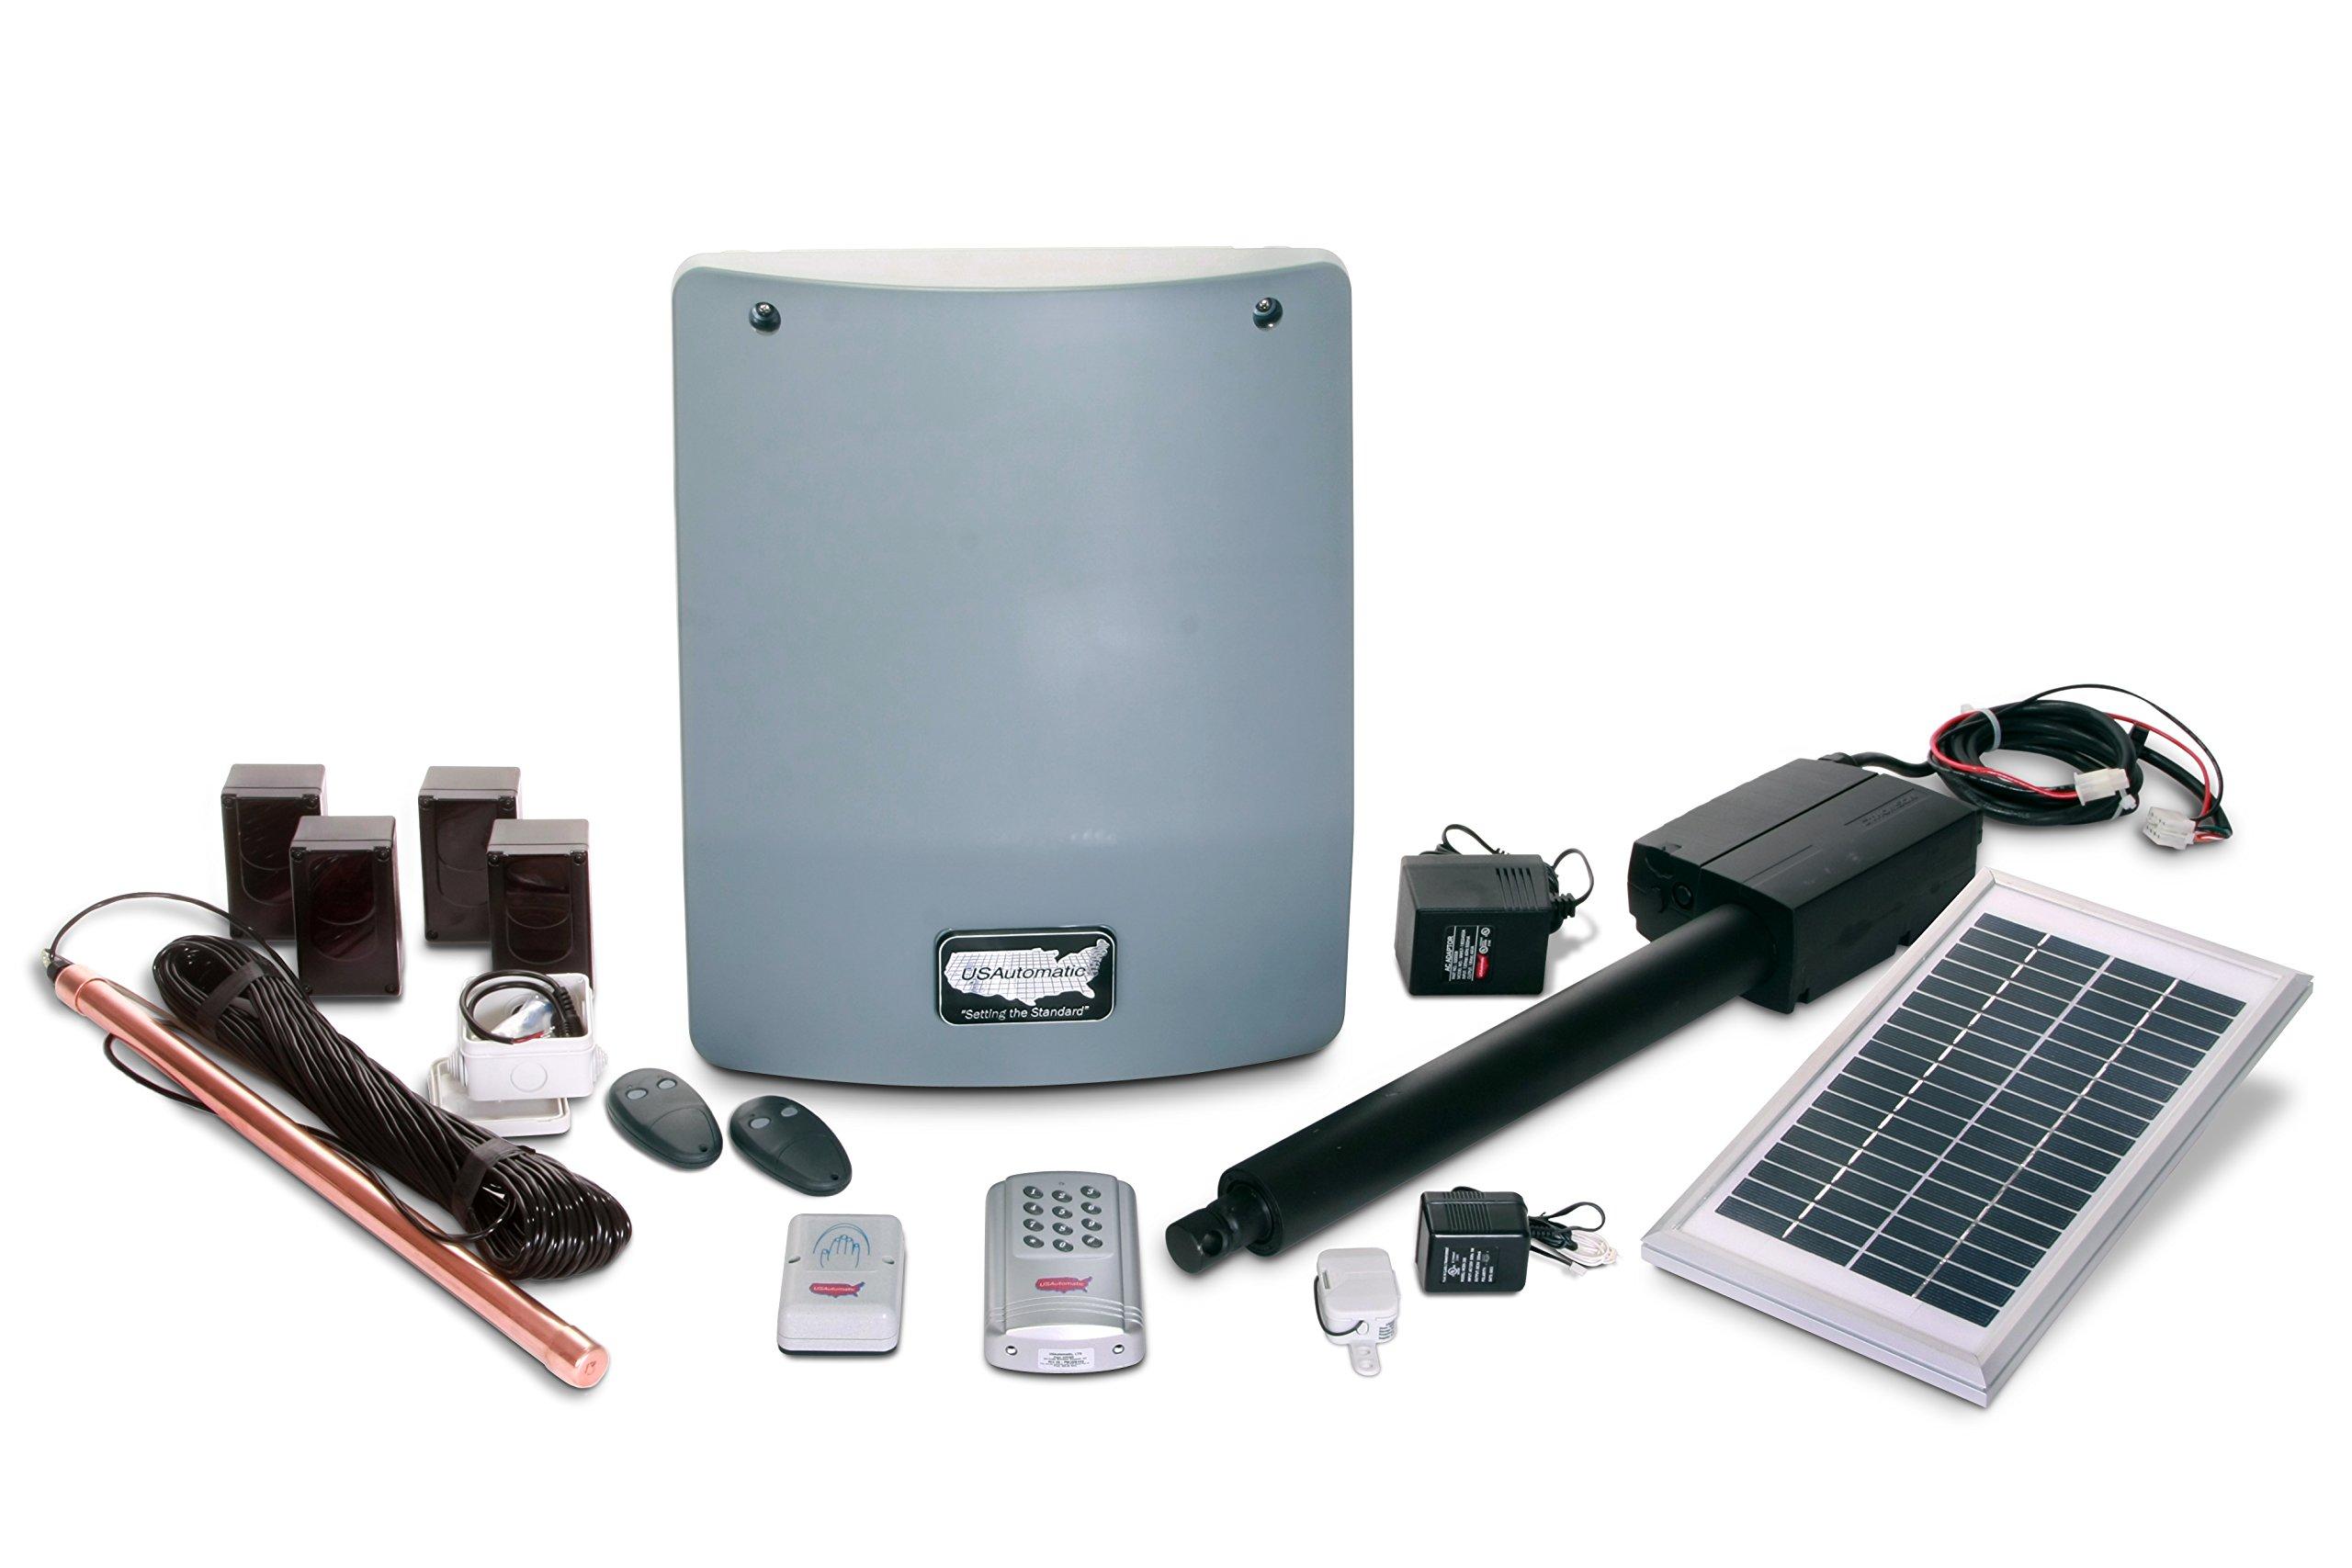 USAutomatic 020350 Medium 300 Solar Charged Automatic Gate Opener Single Gate Fully Automated Kit